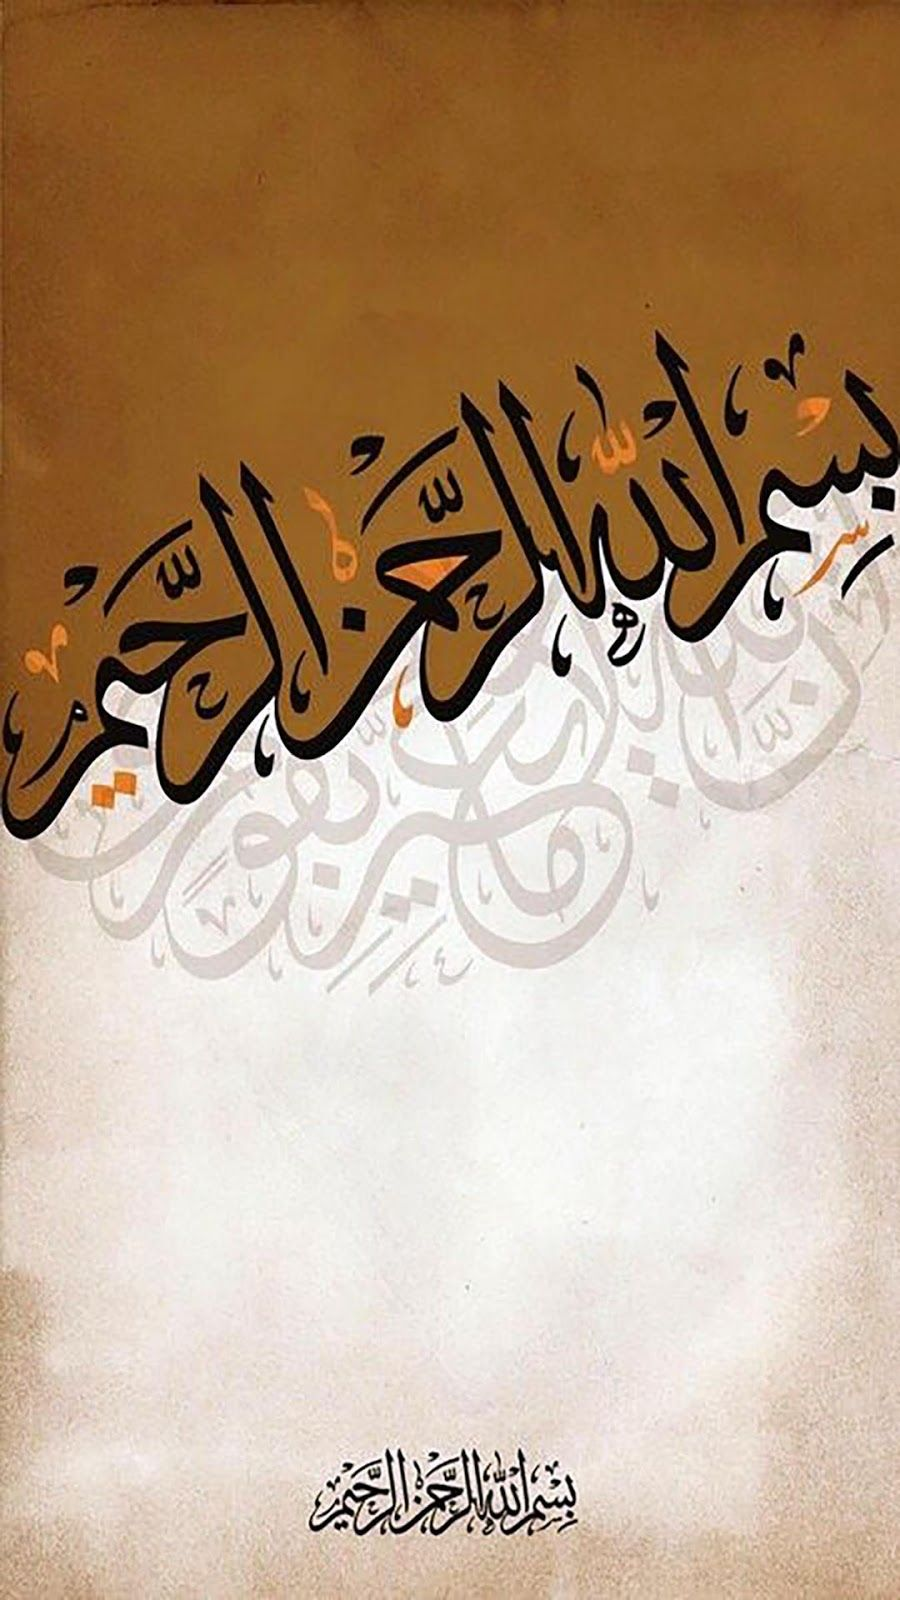 Kaligrafi Seni kaligrafi, Kaligrafi islam, Seni